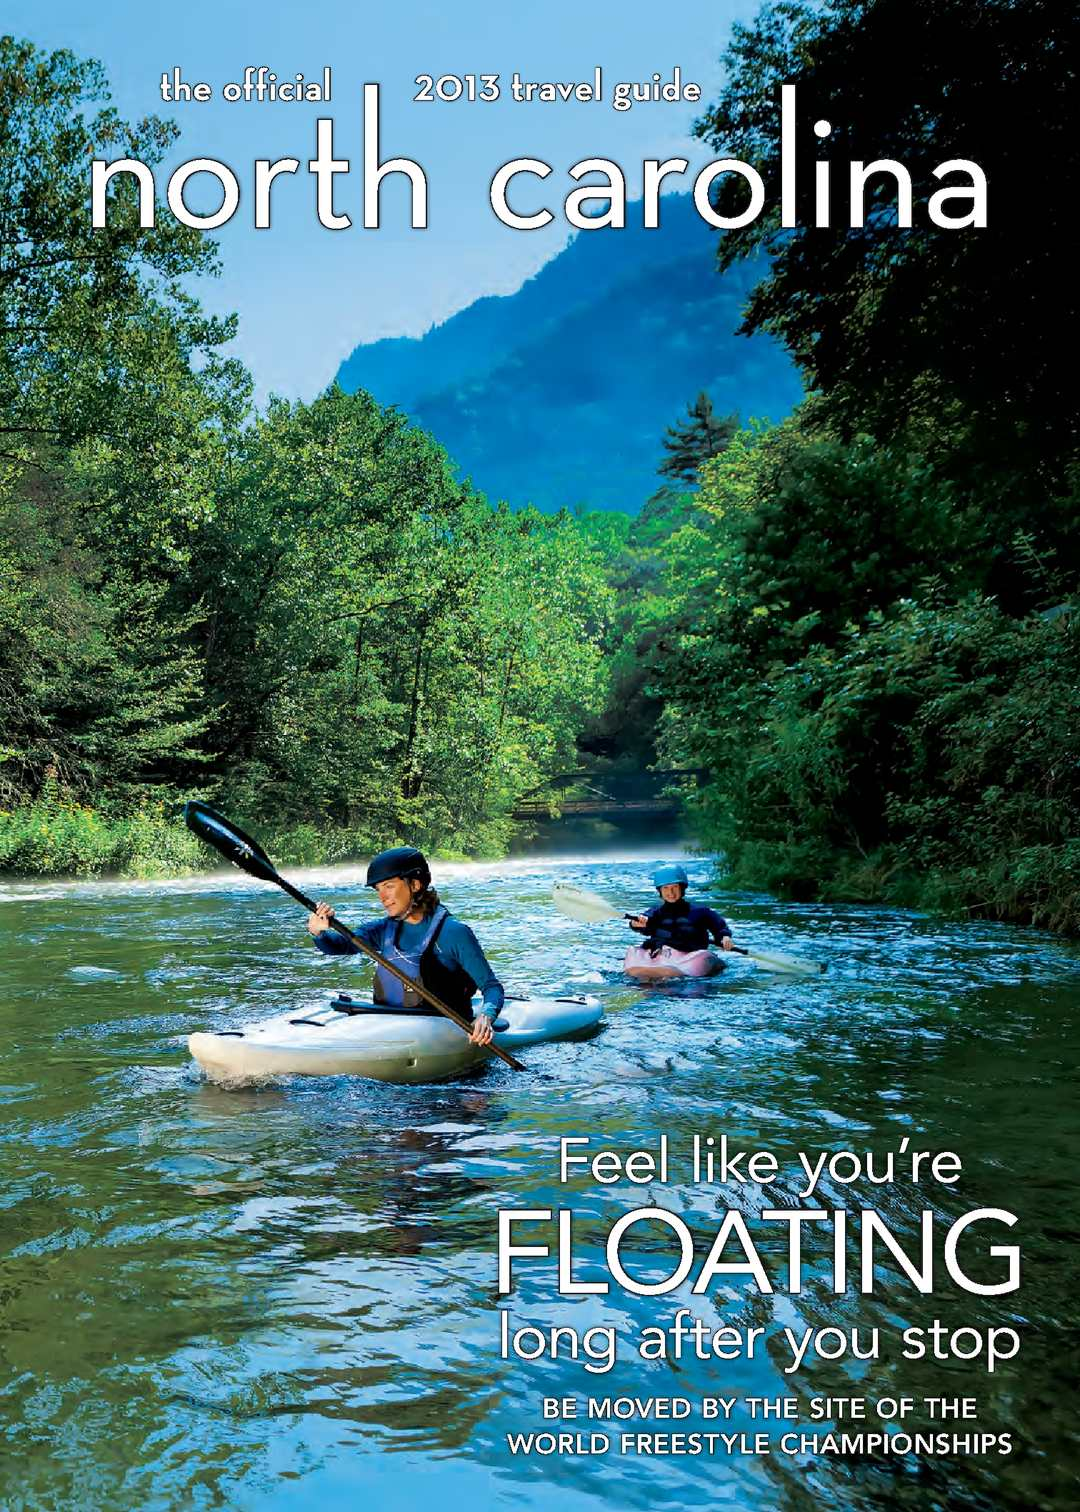 Calamo 2013 Official North Carolina Travel Guide Natural 100 Top Imperial Topaz 1427